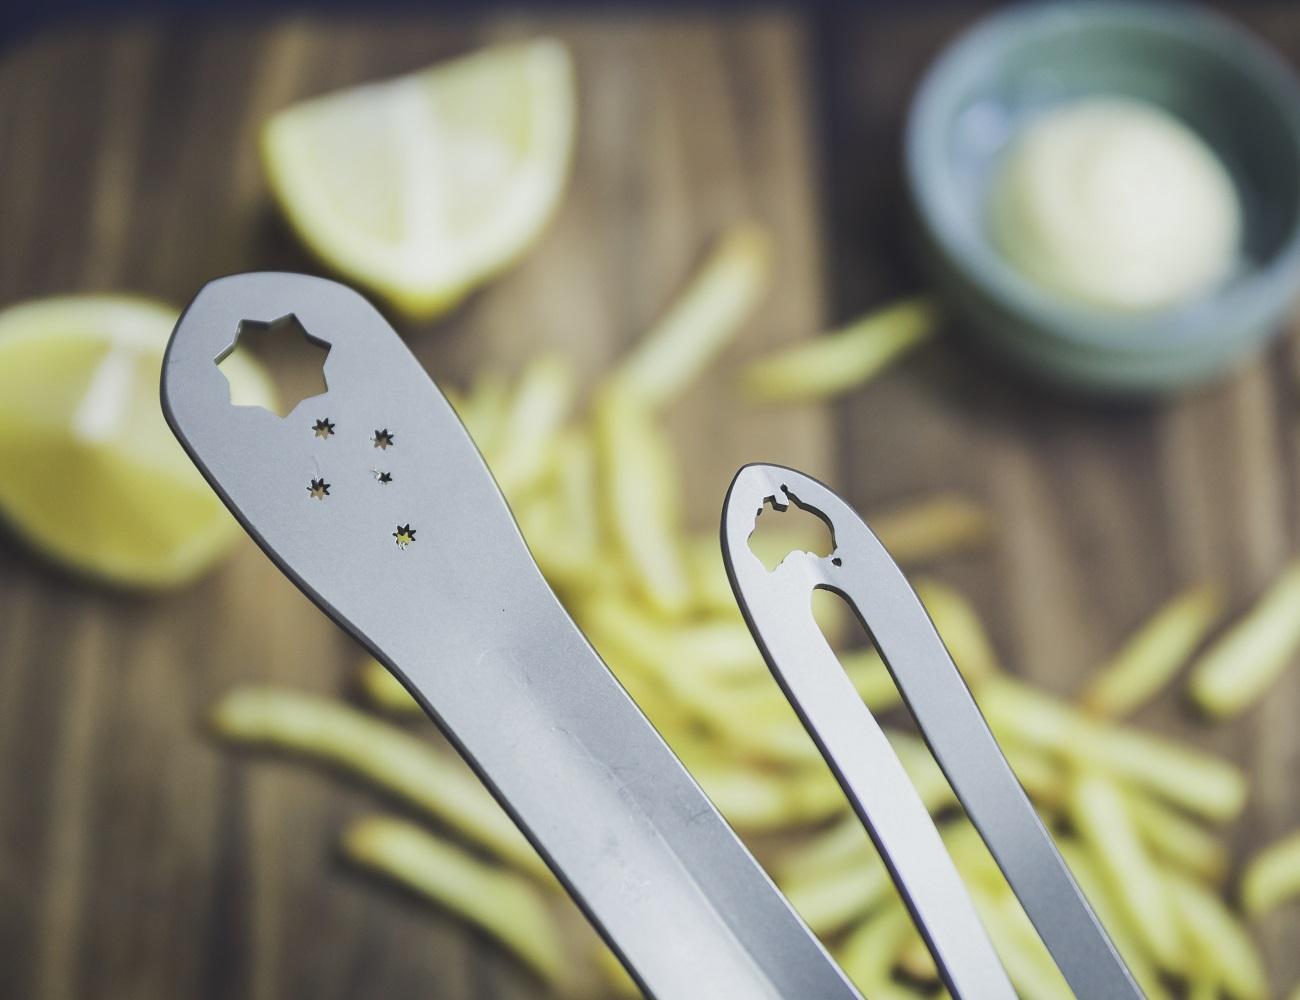 SOLIDteknics nöni Seamless Stainless Saucepan